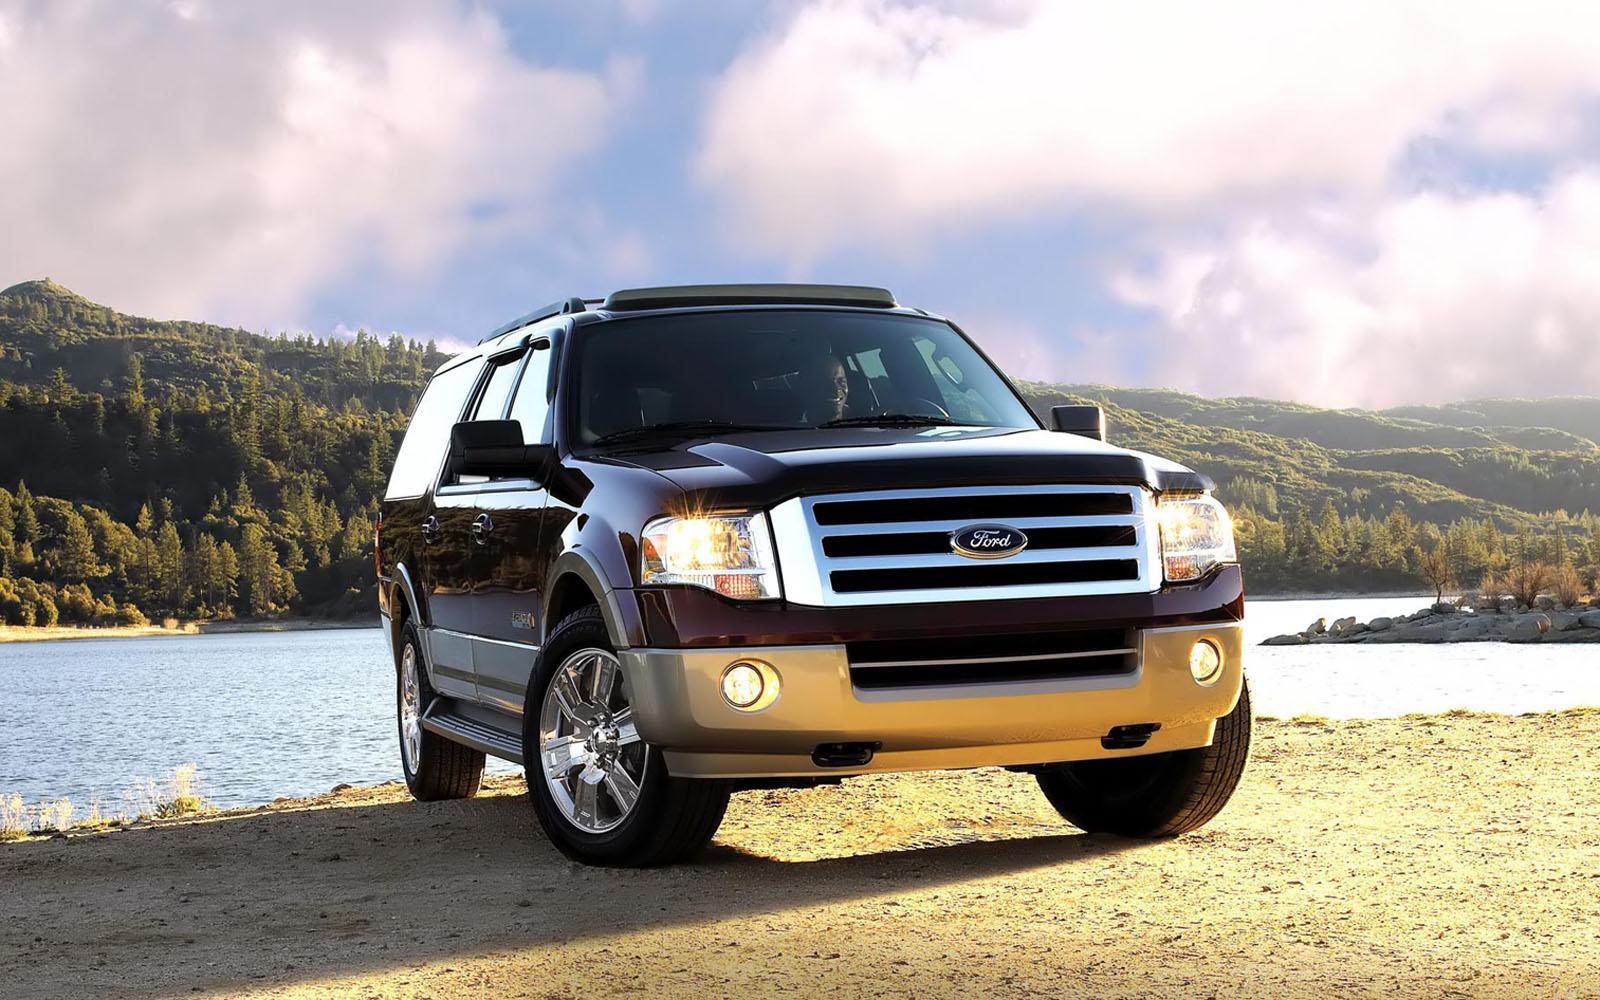 Ford Expedition Superb Car Wallpapers Desktop Wallpaper HD Wallpaper 1600x1000